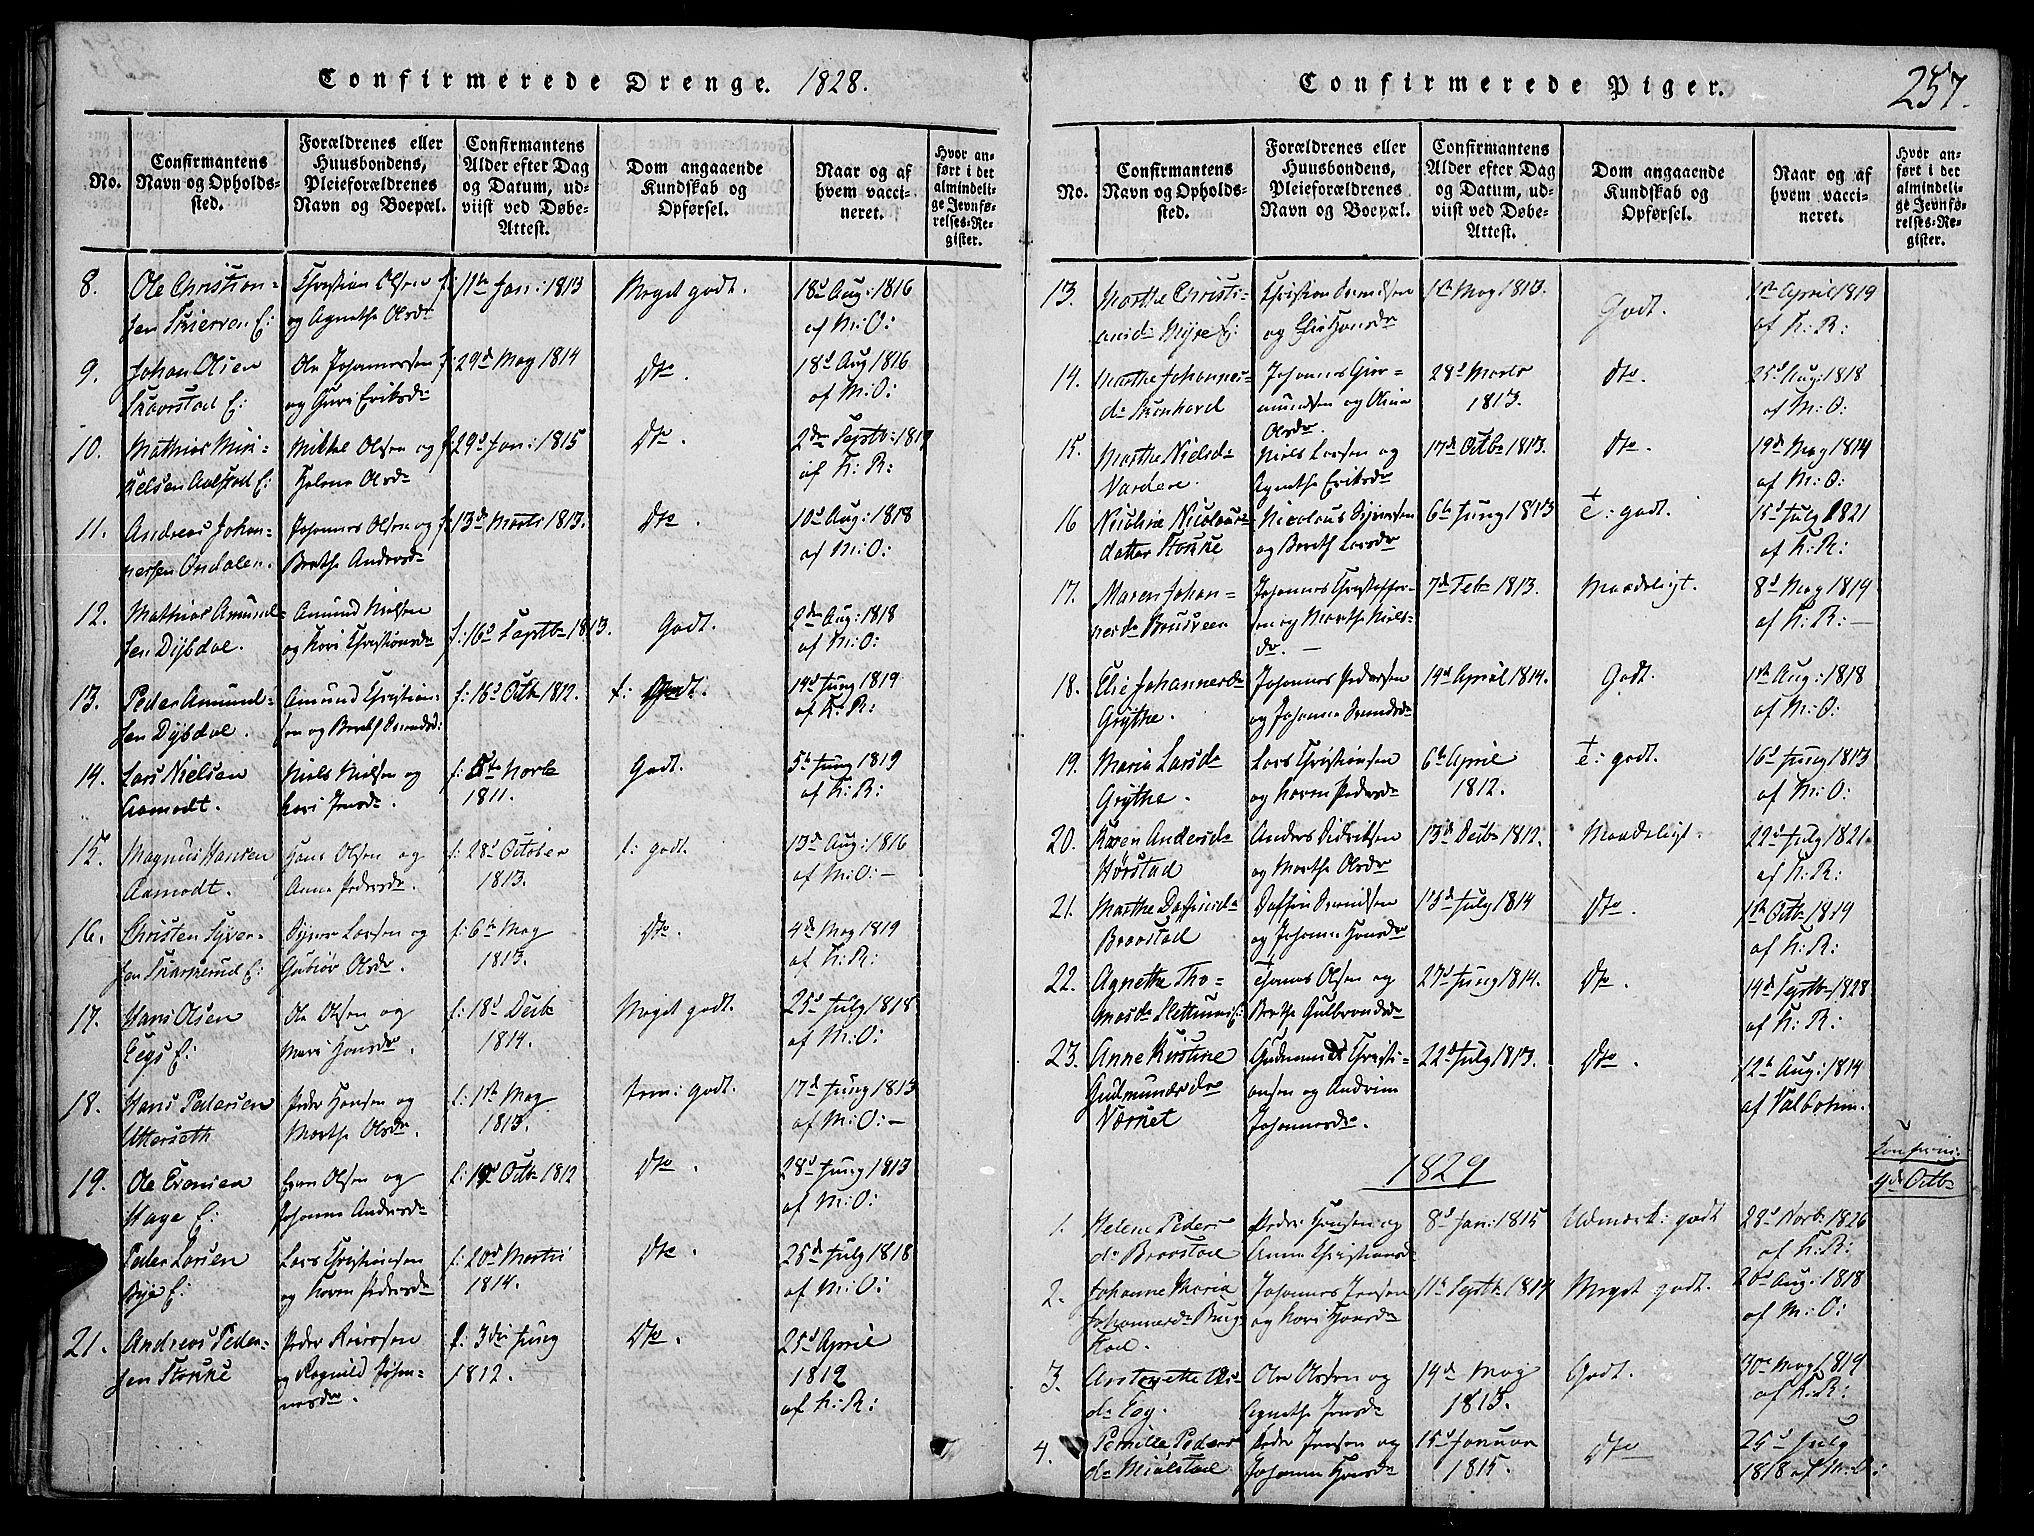 SAH, Vardal prestekontor, H/Ha/Haa/L0004: Ministerialbok nr. 4, 1814-1831, s. 257